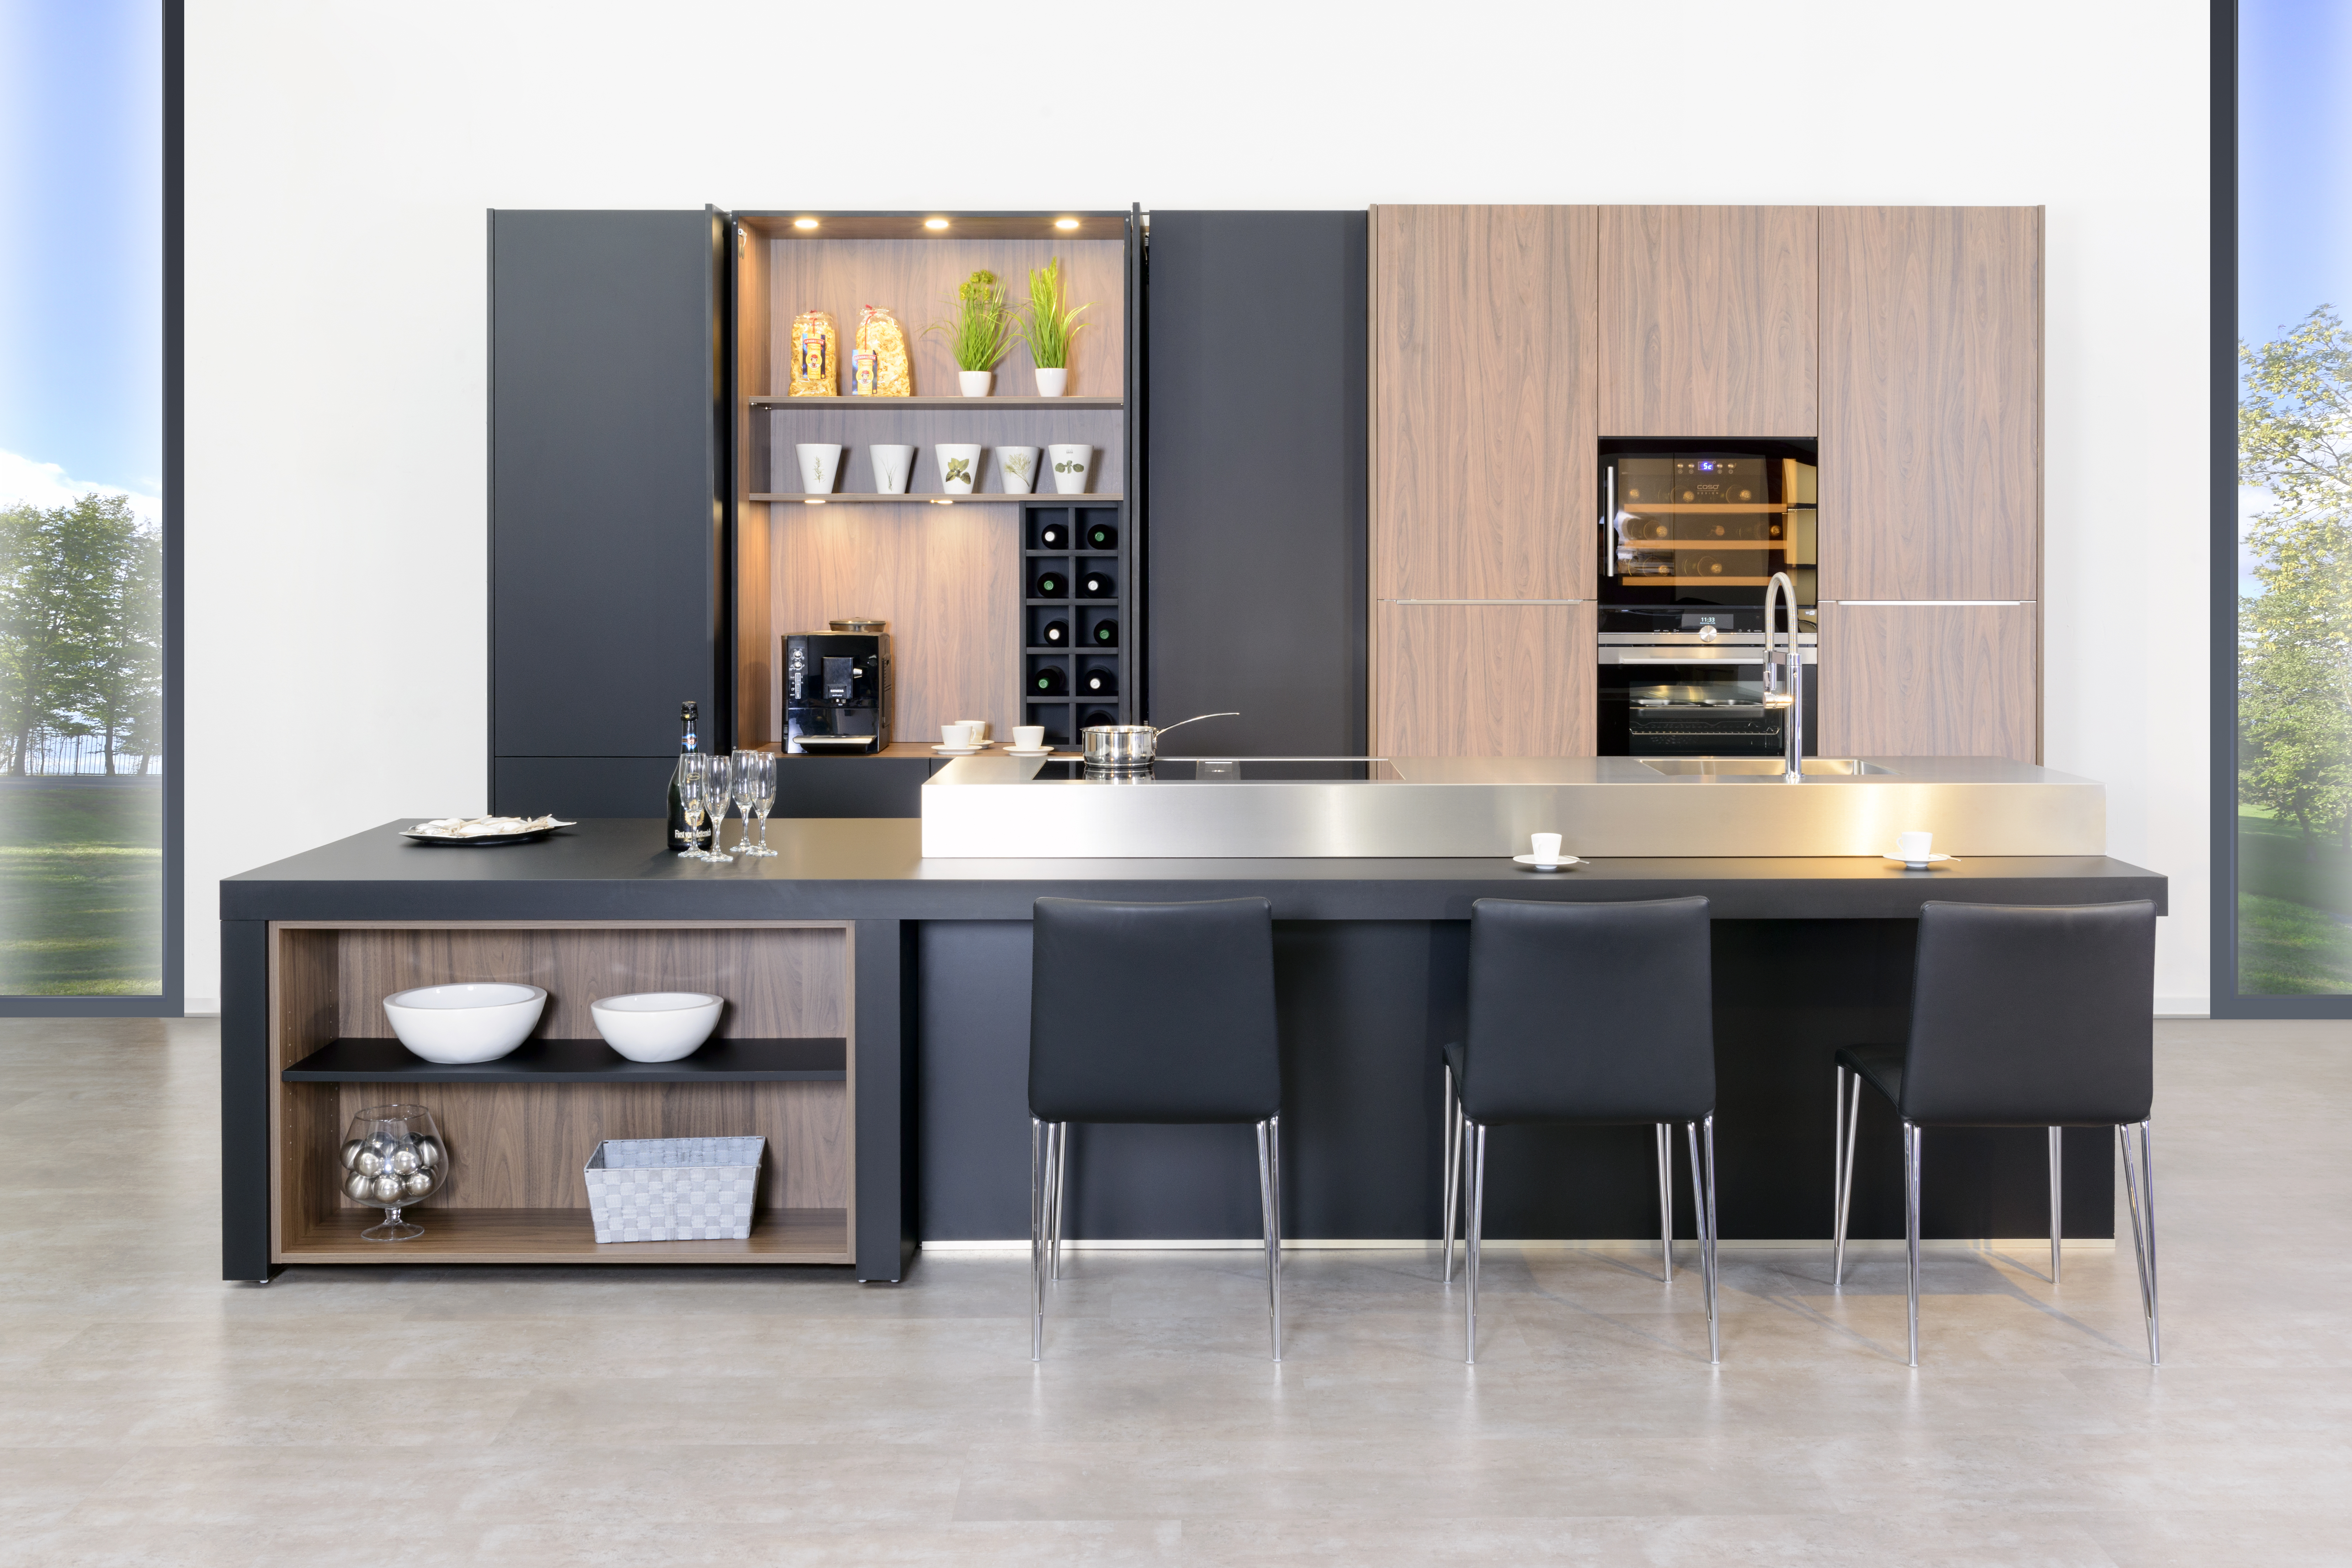 Modern Kitchen Cabinets Luxury Cabinetry Italian Style Kitchen With Pocket Door Ebay